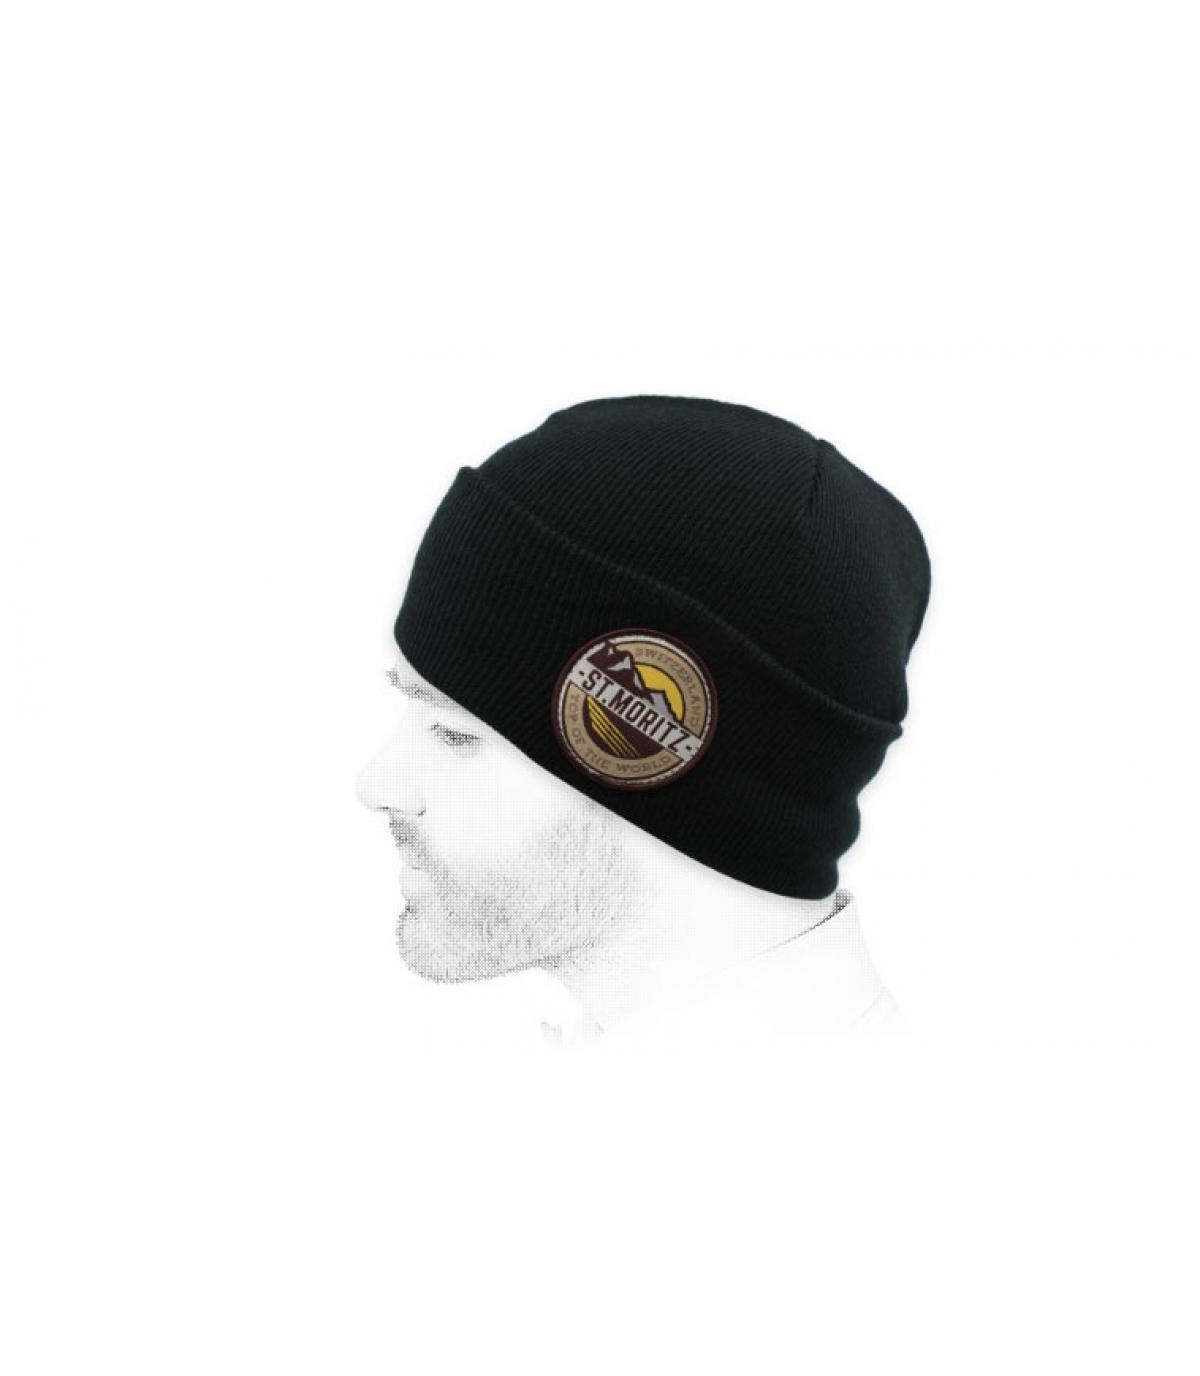 bonnet st moritz